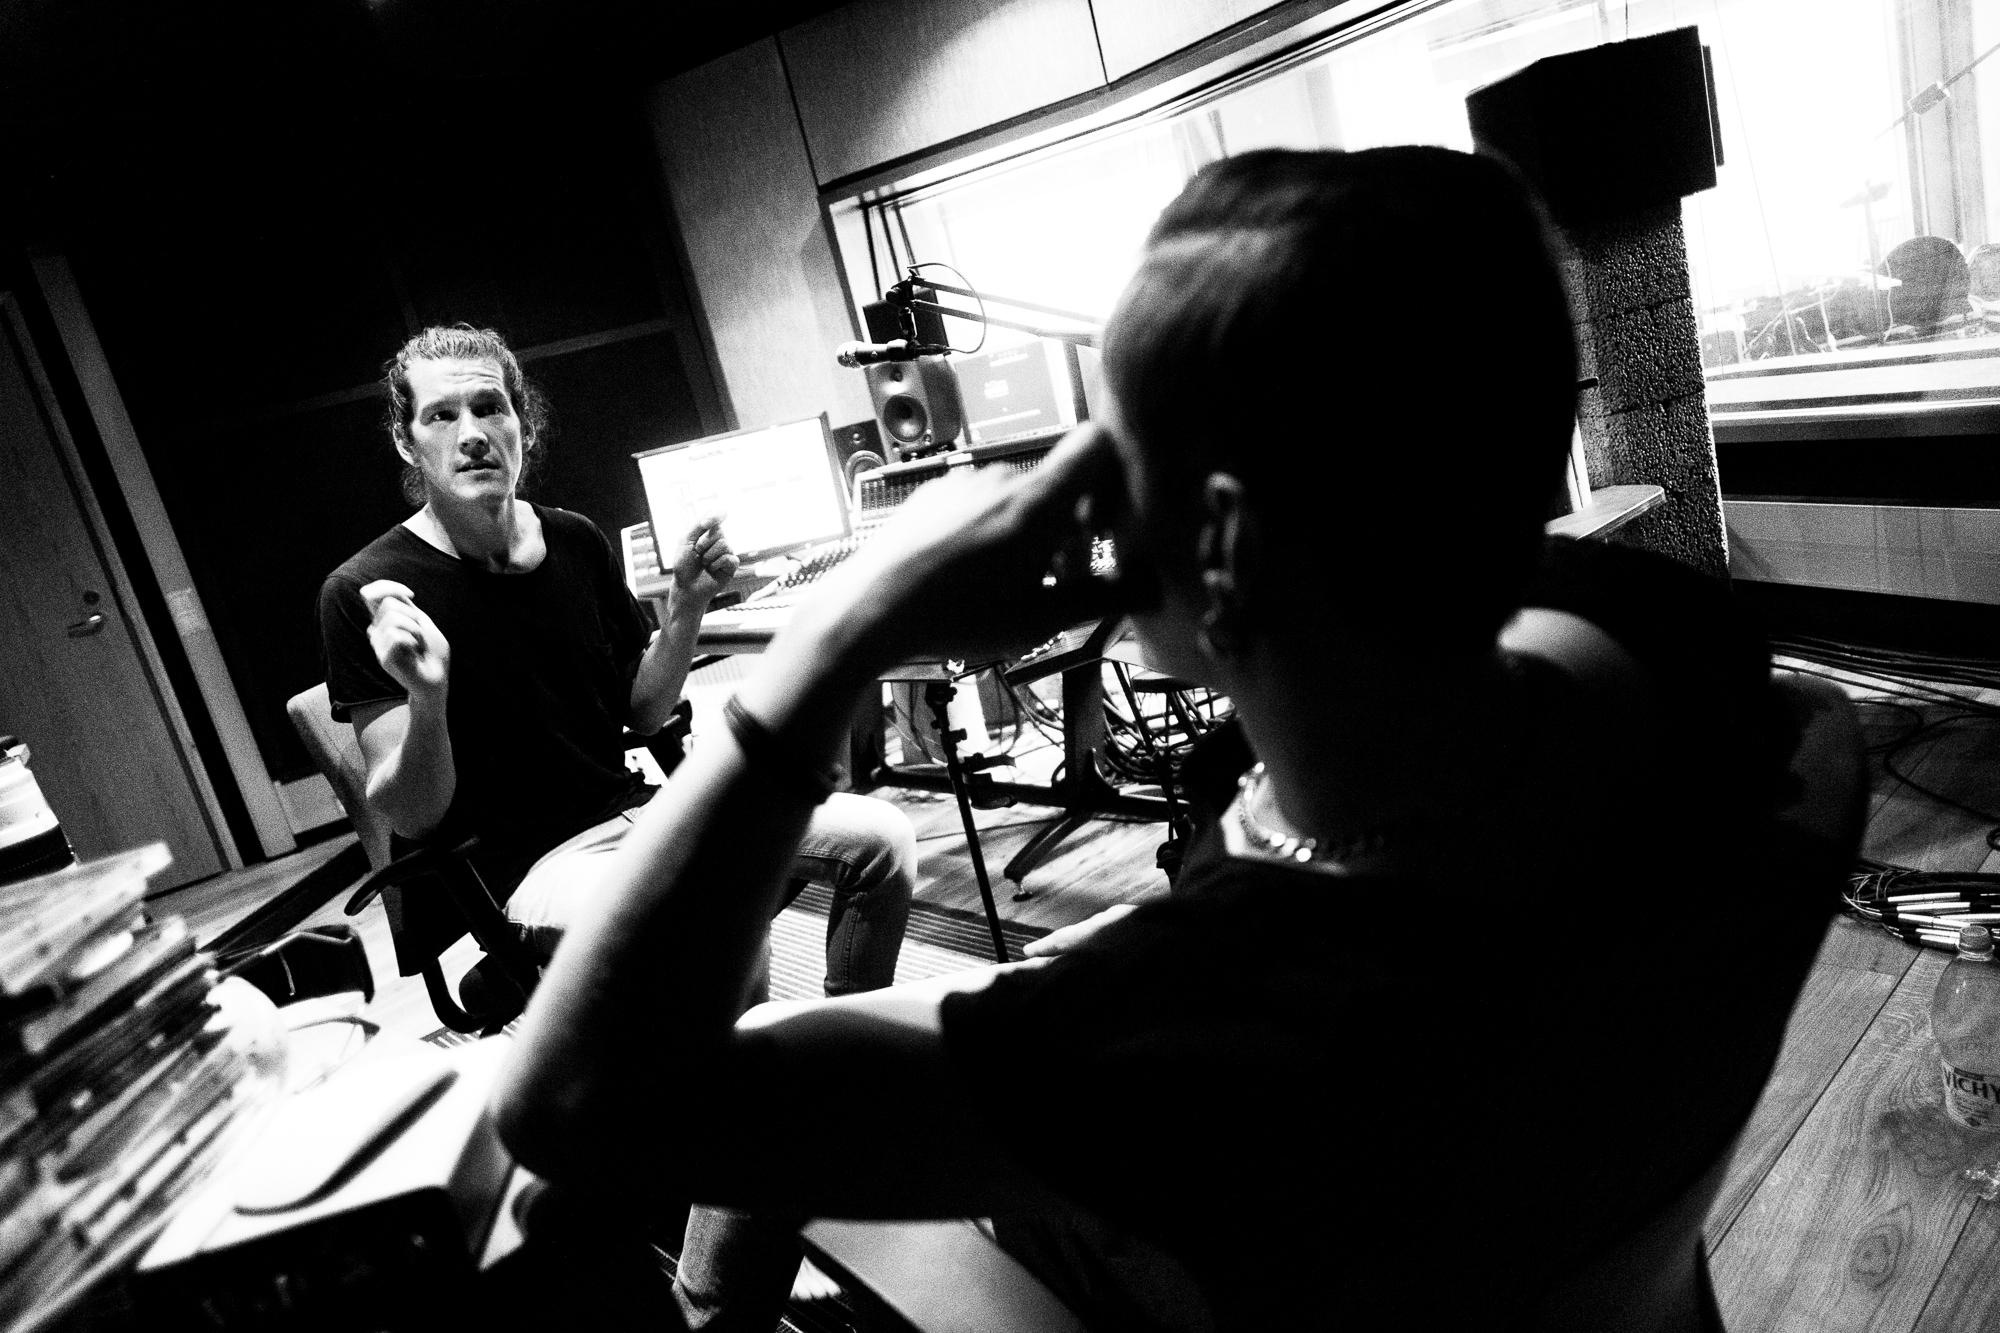 Producer Arto Tuunela showing drumming moves to CMX drummer Olli-Matti Wahlström.